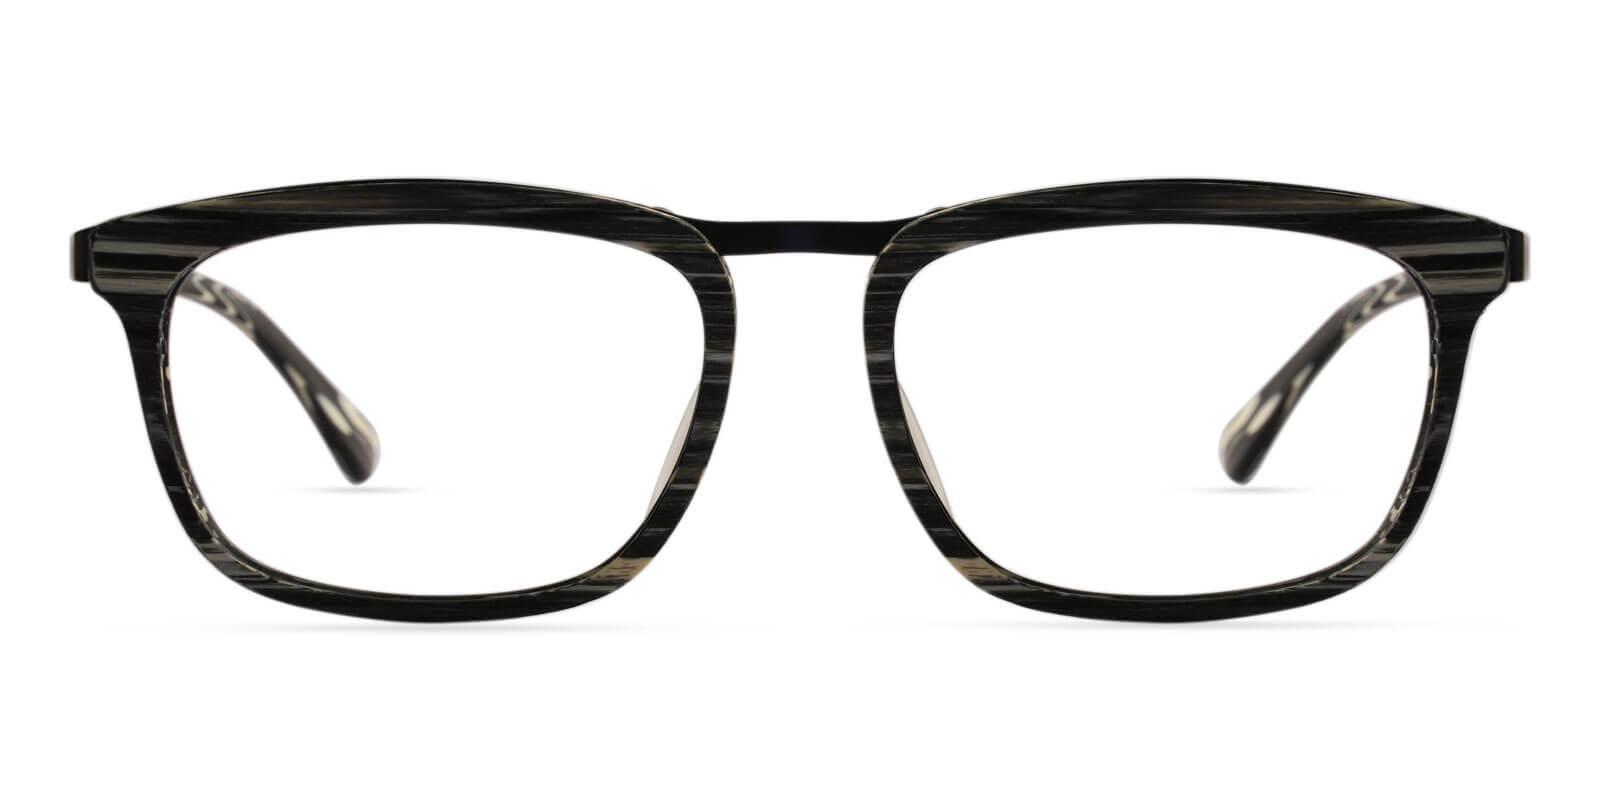 Audrey Pattern Acetate , Metal Eyeglasses , UniversalBridgeFit Frames from ABBE Glasses